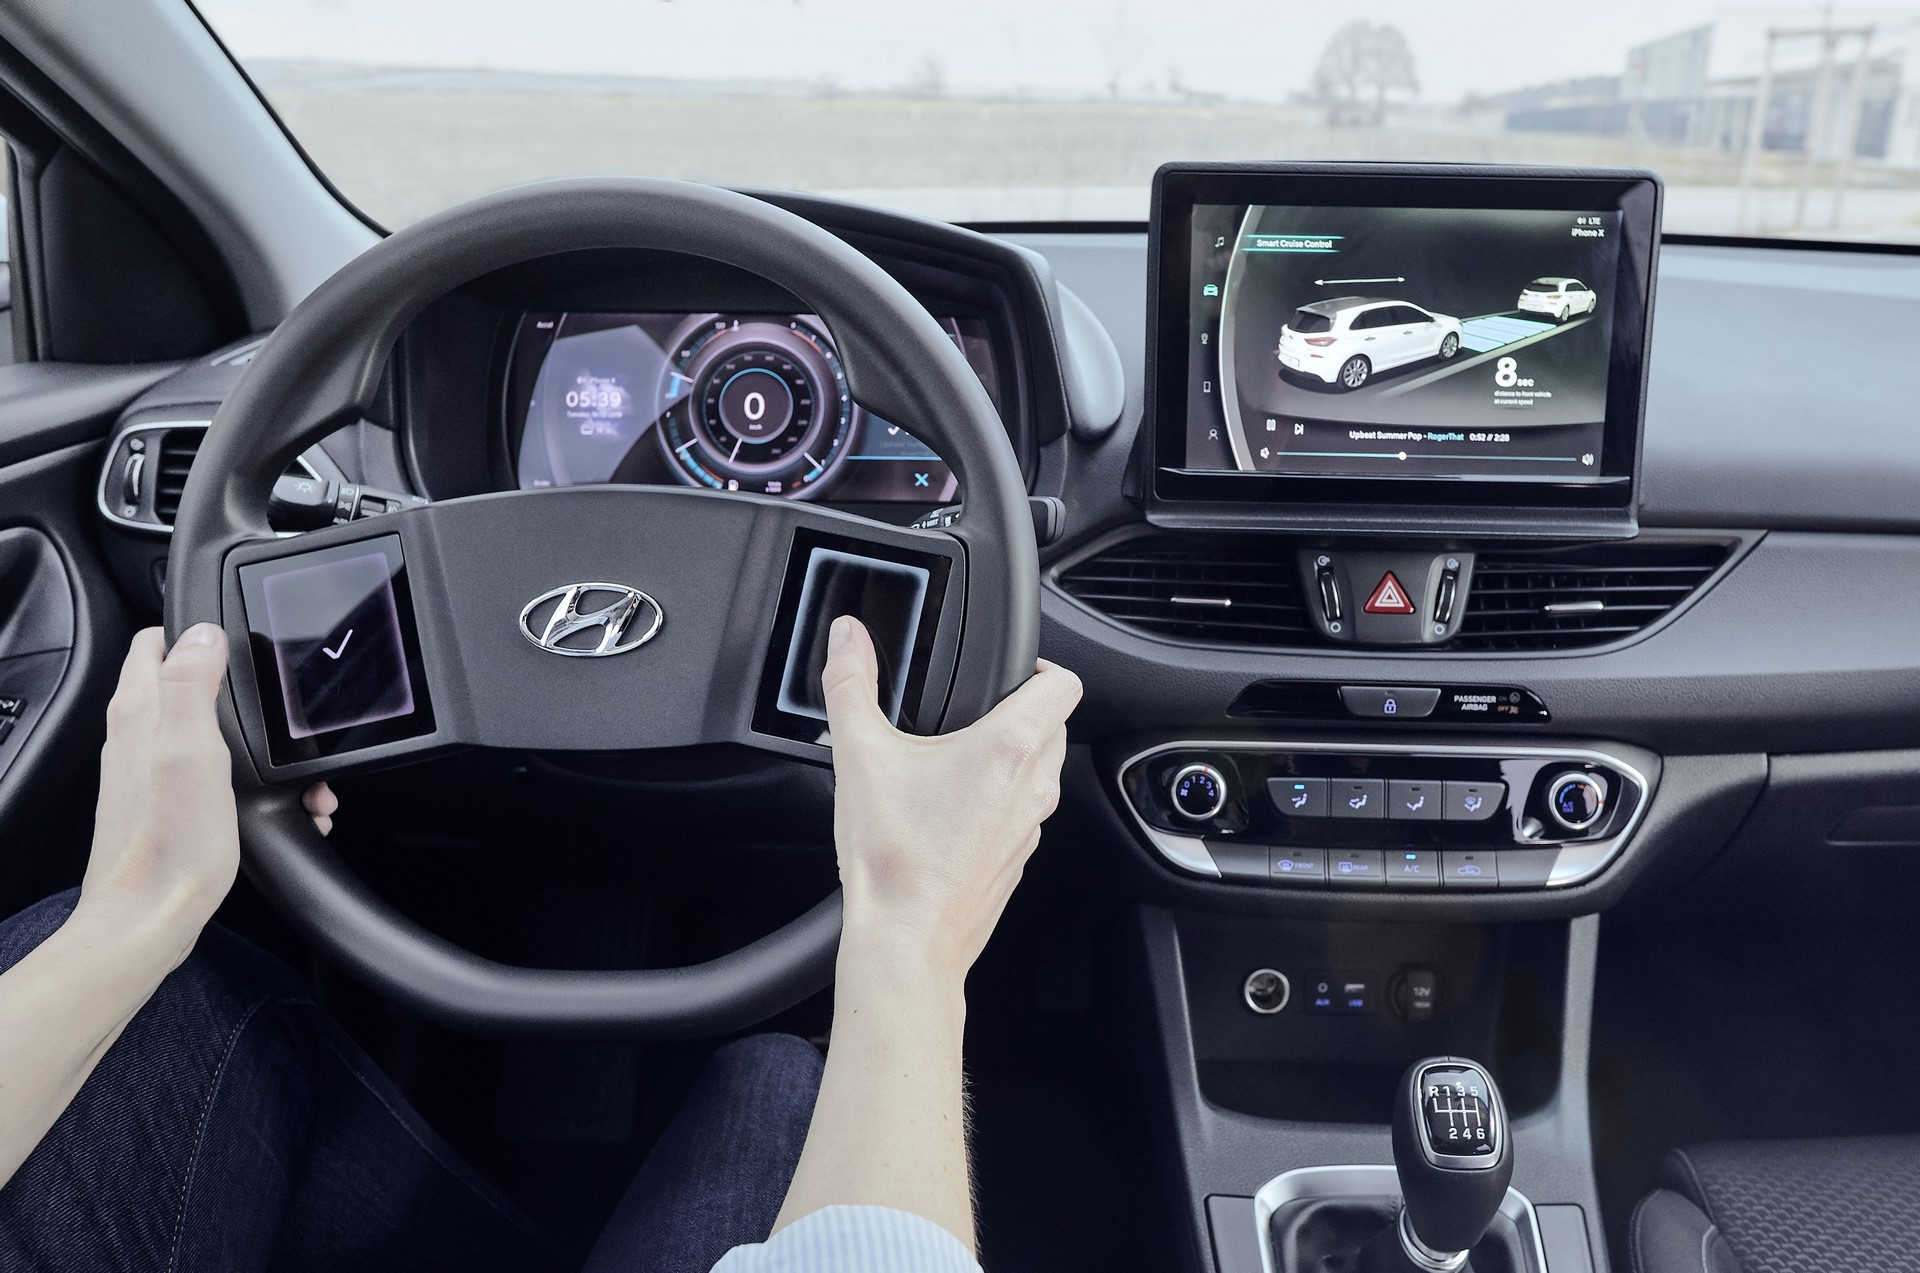 Hyundai-Virtual-cockpit-2019-Hyundai_TechDay_i30_Workshop_238-1